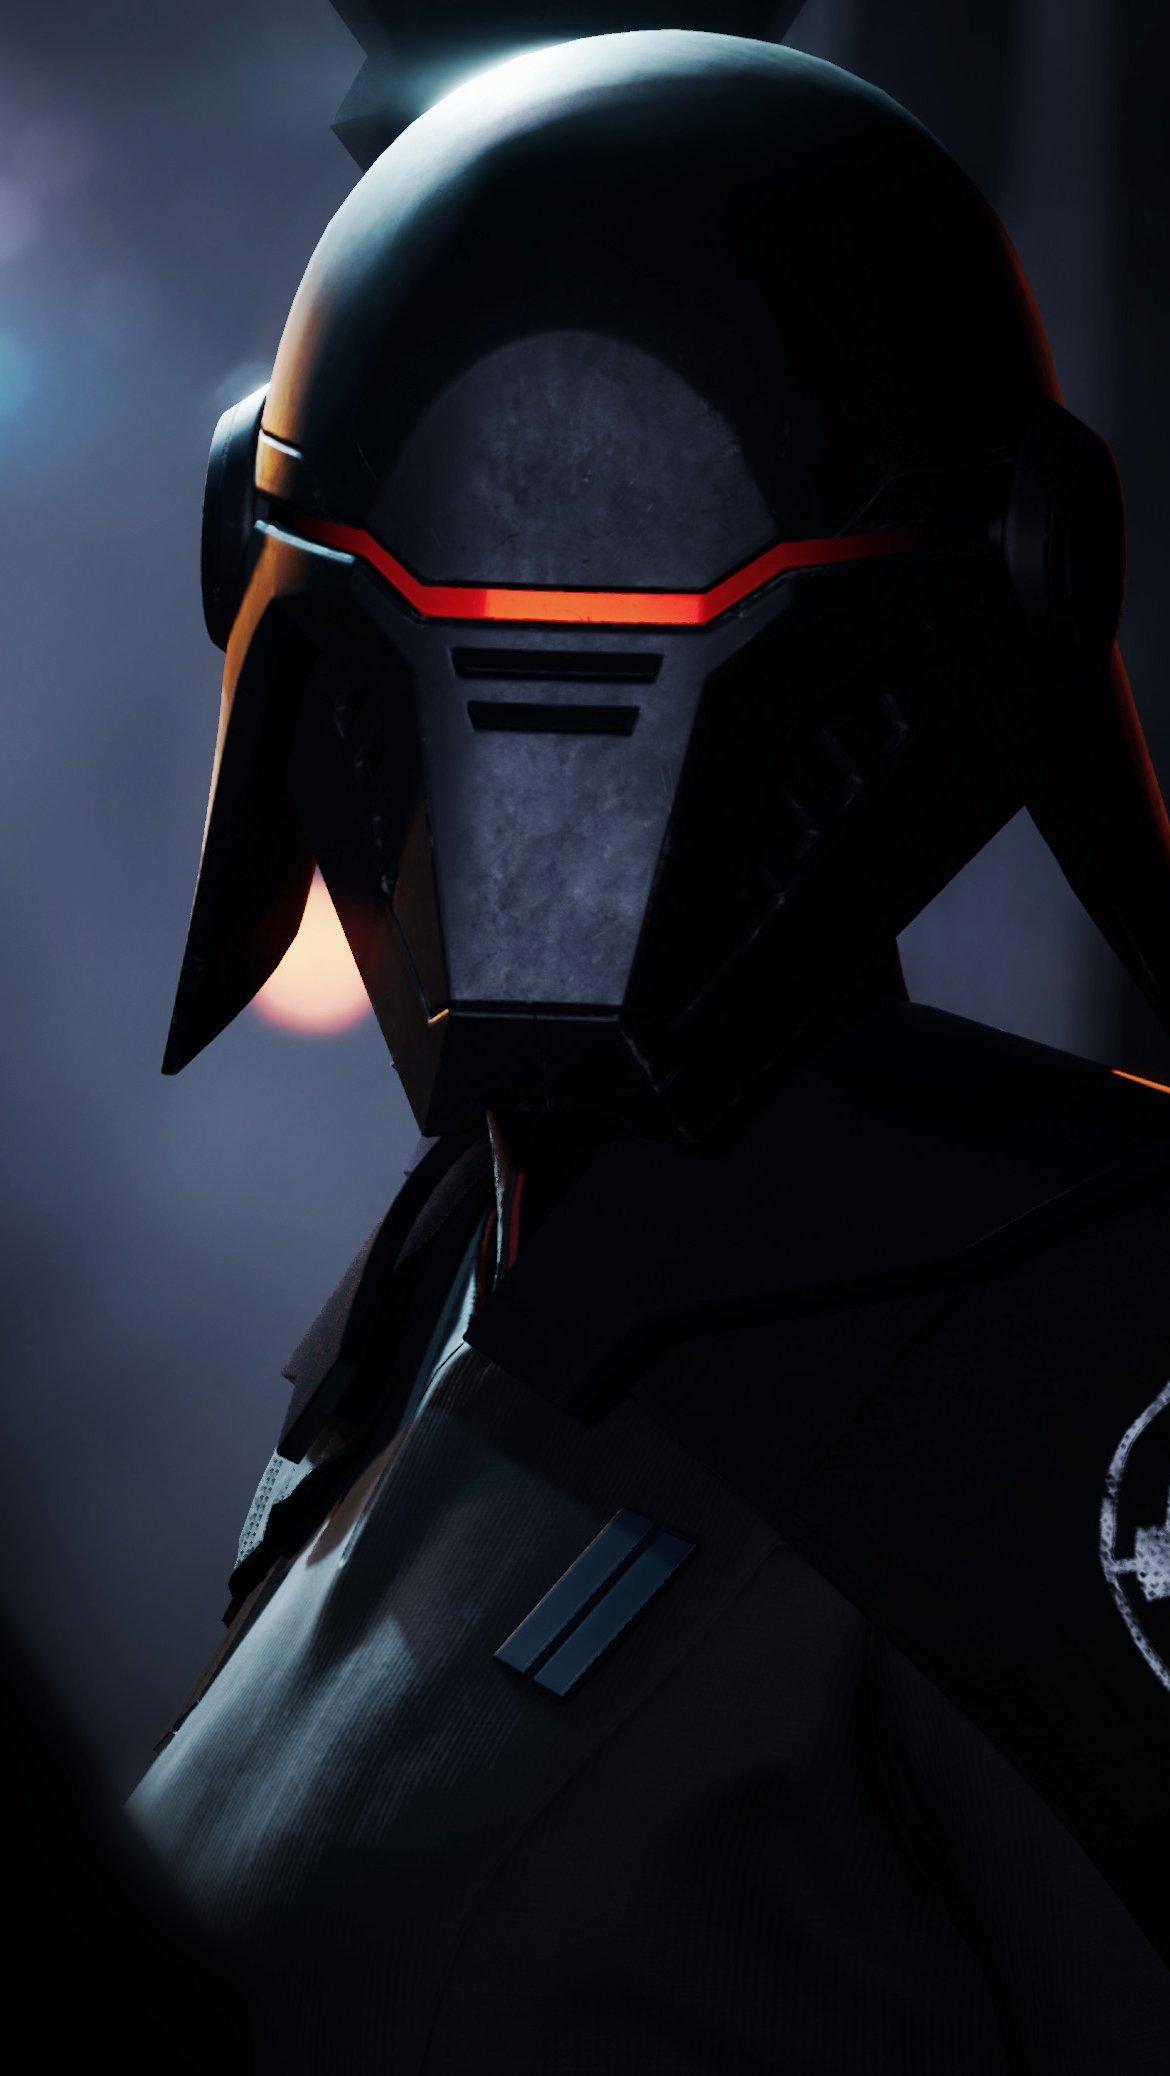 Fondos de pantalla Star Wars Jedi Fallen Order Juego Vertical